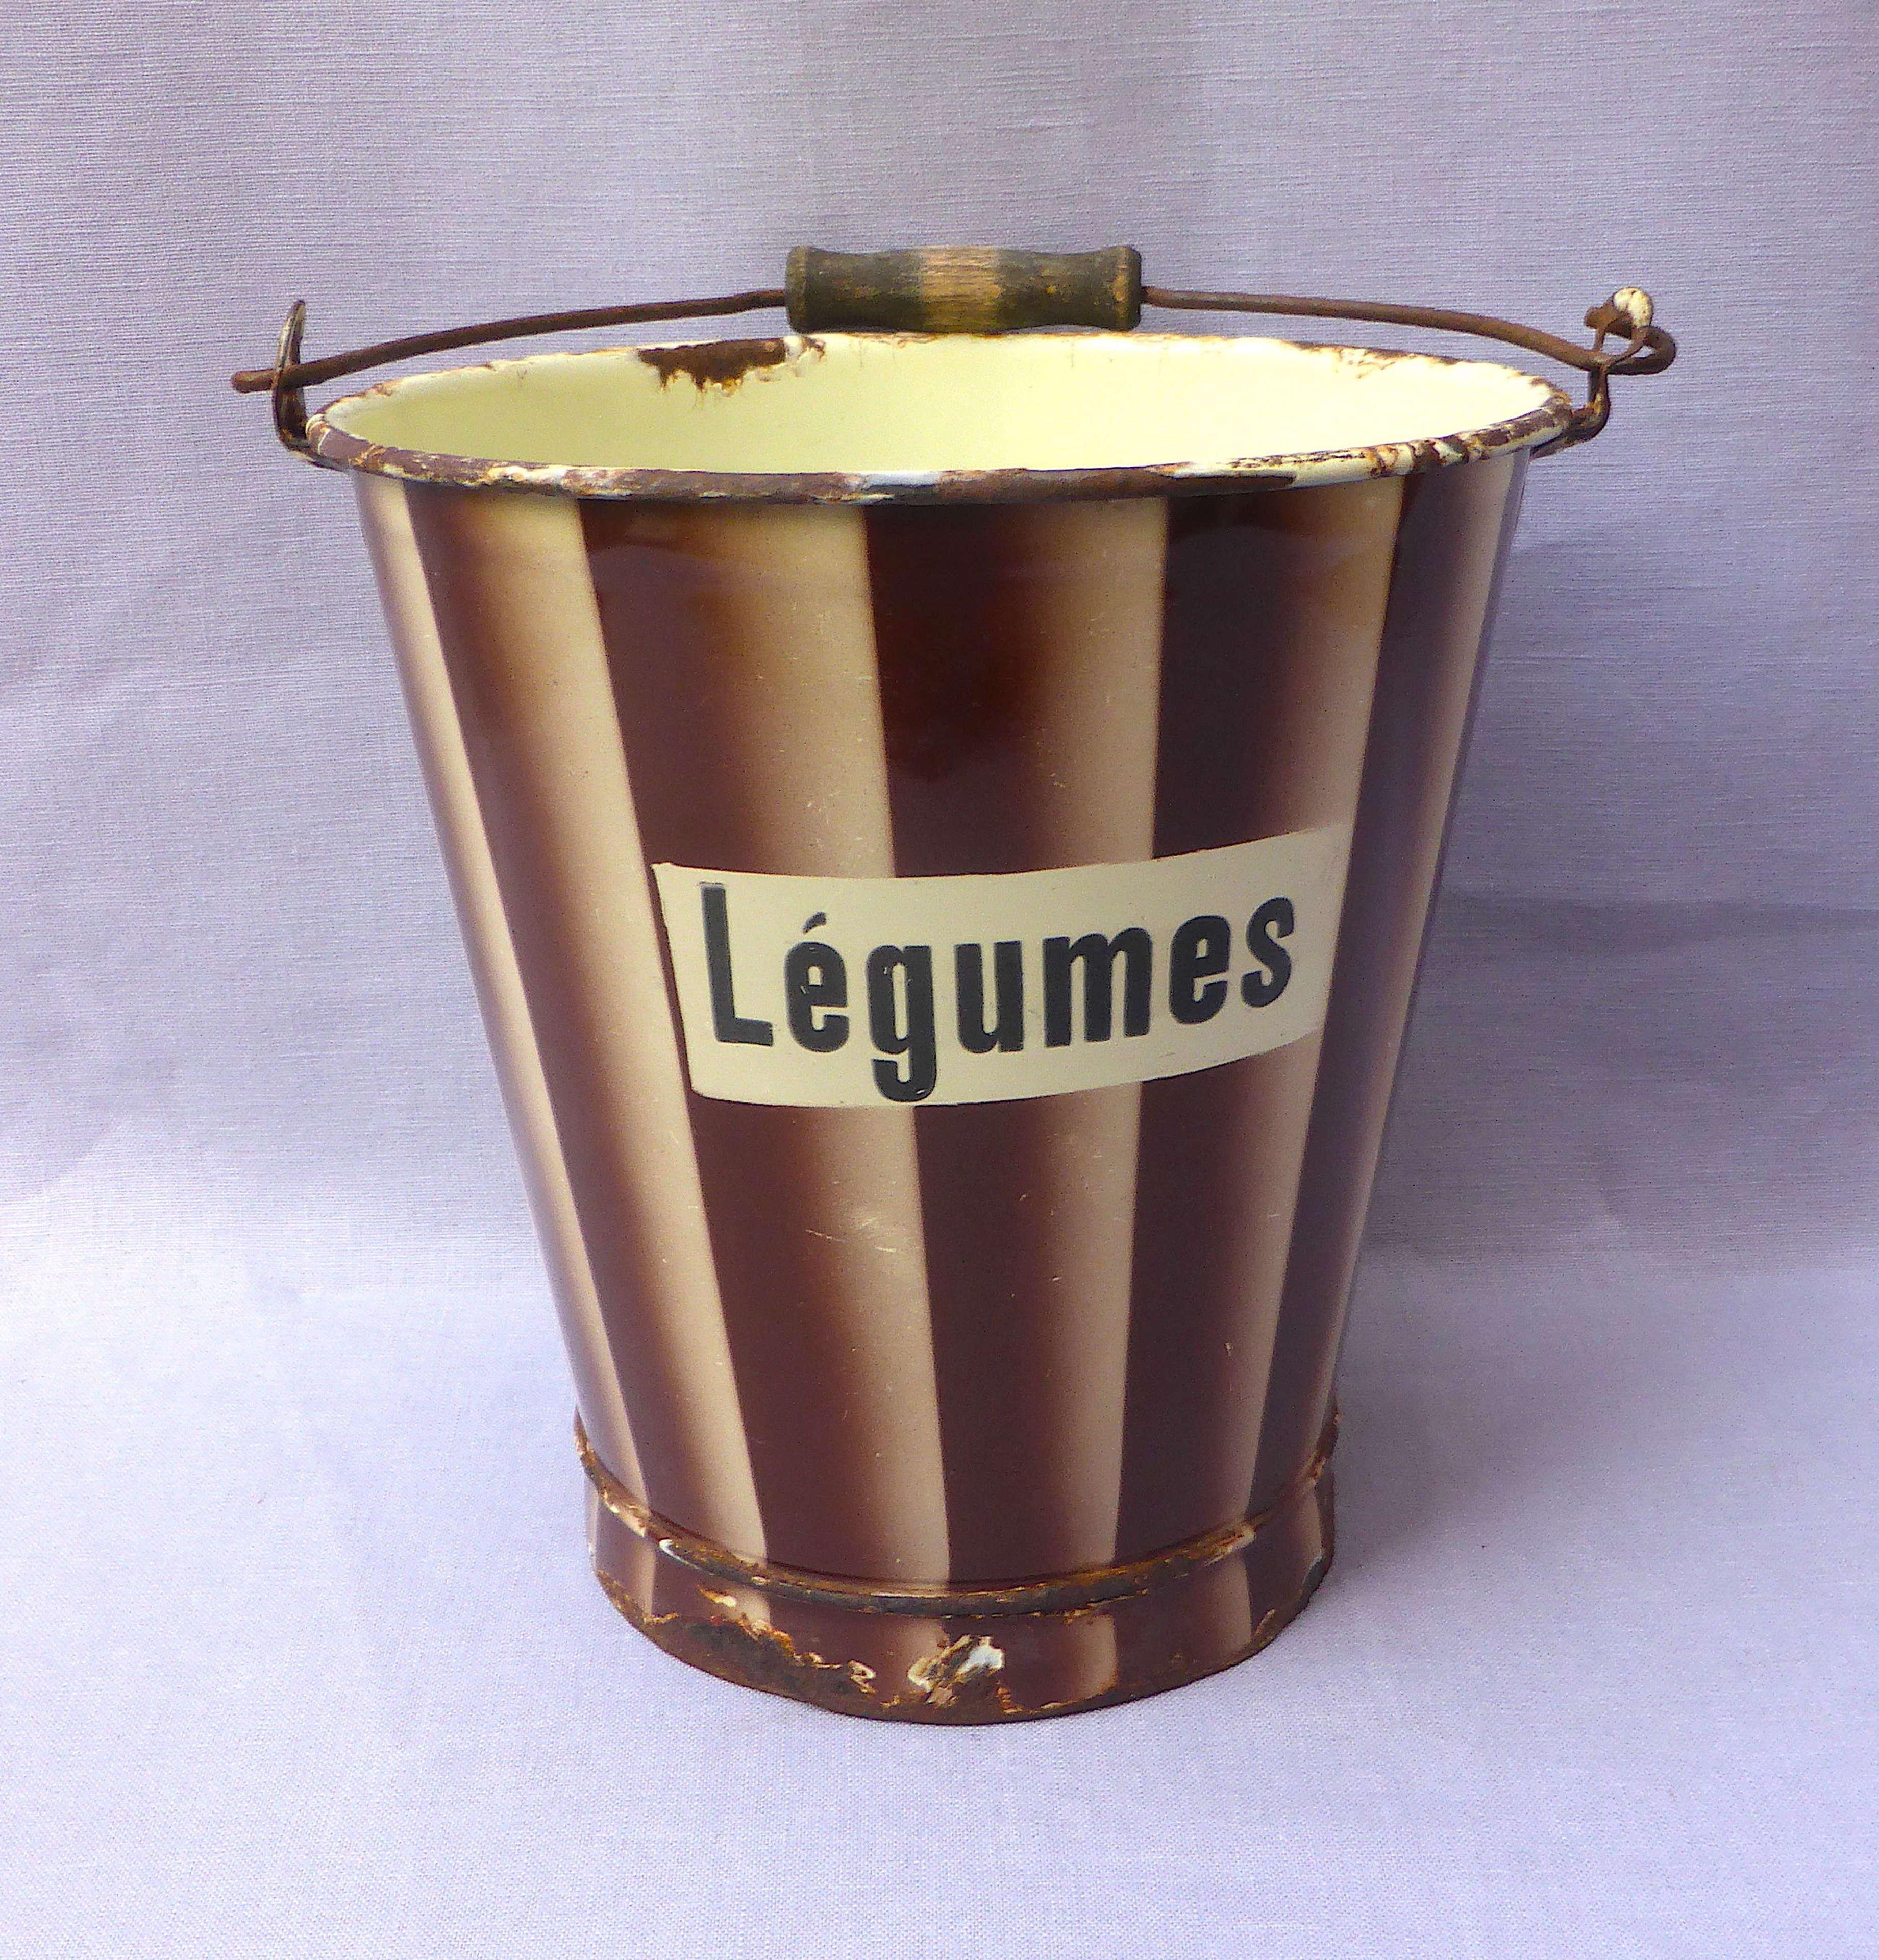 1930s French enamelware légumes bucket